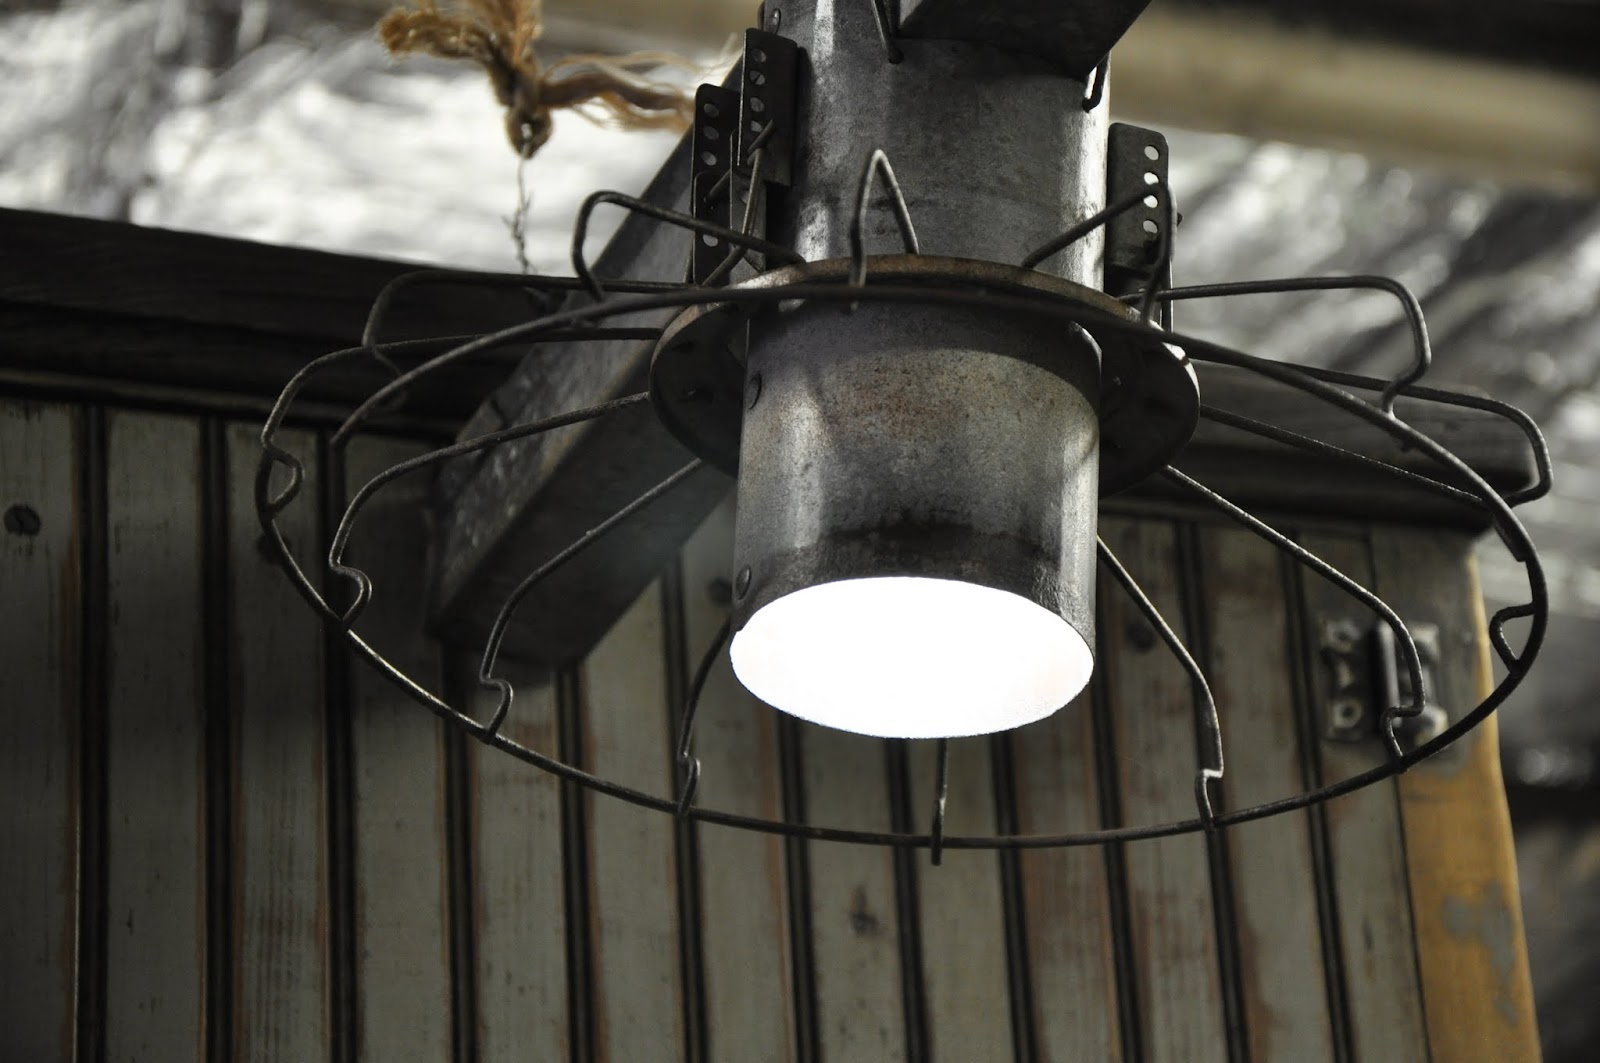 Oklahoma Barn Market: Chicken Coop Heater